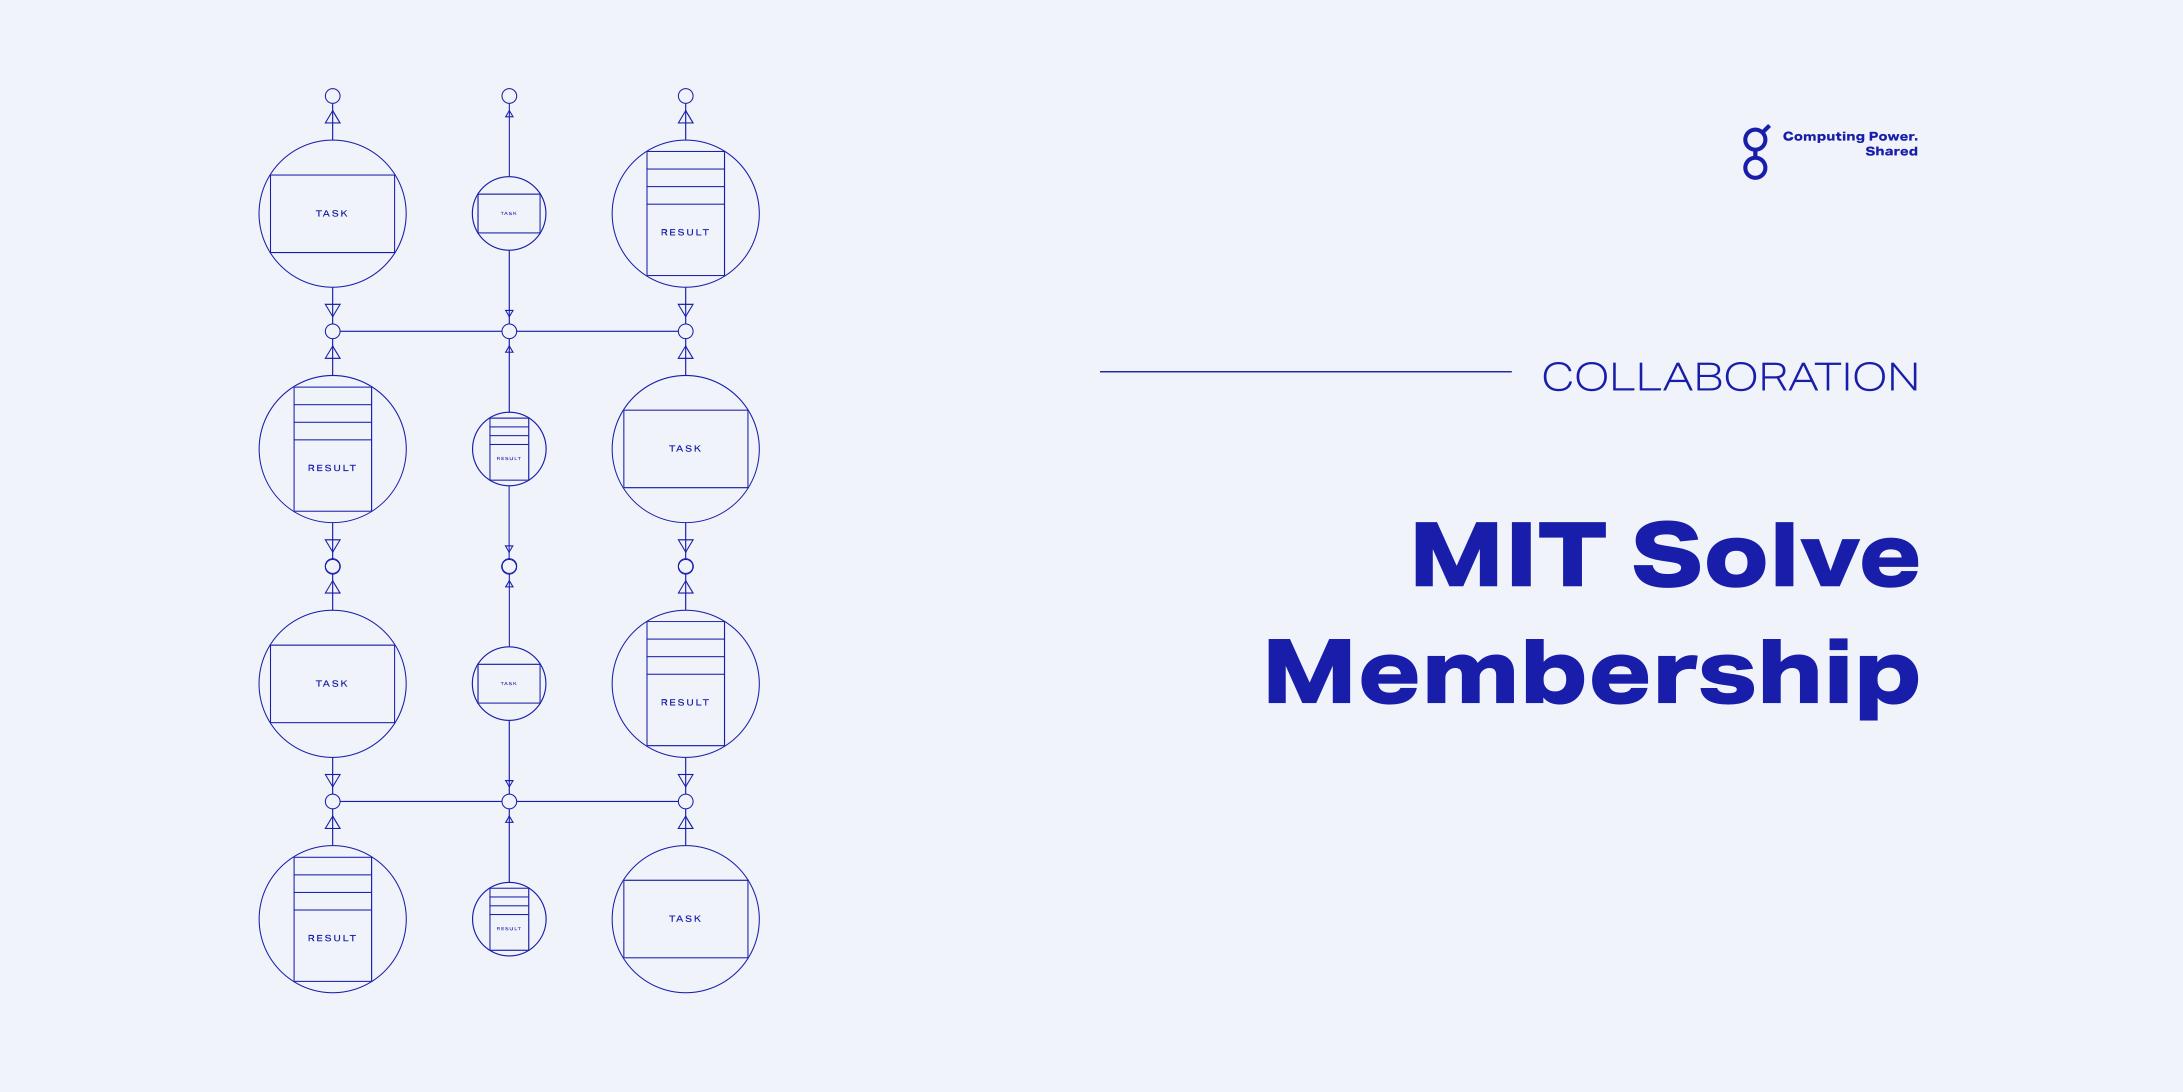 Golem joins the MIT Solve community